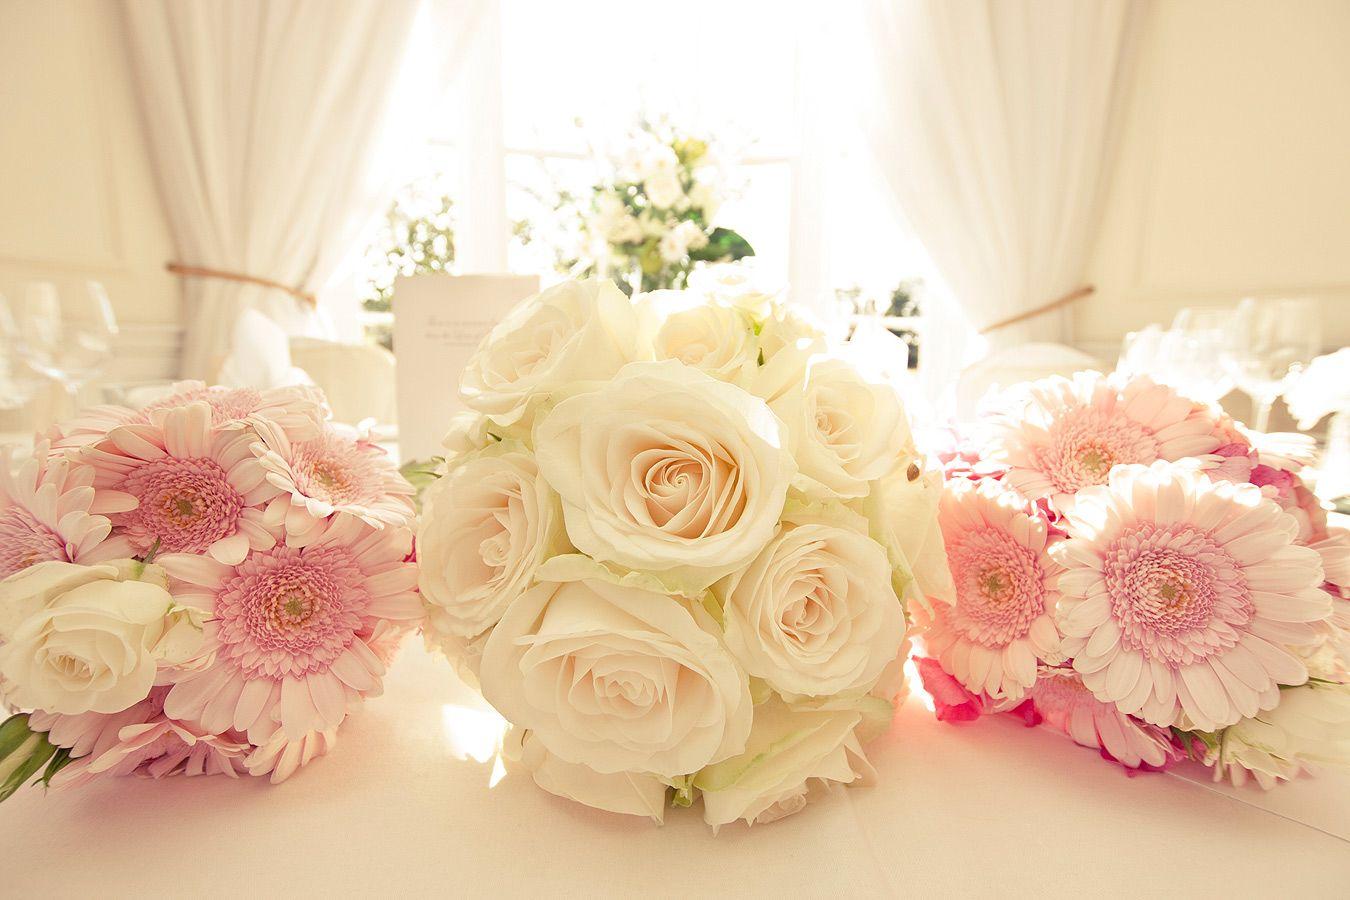 Wedding-details-favours-photography-vintage-natural-candid